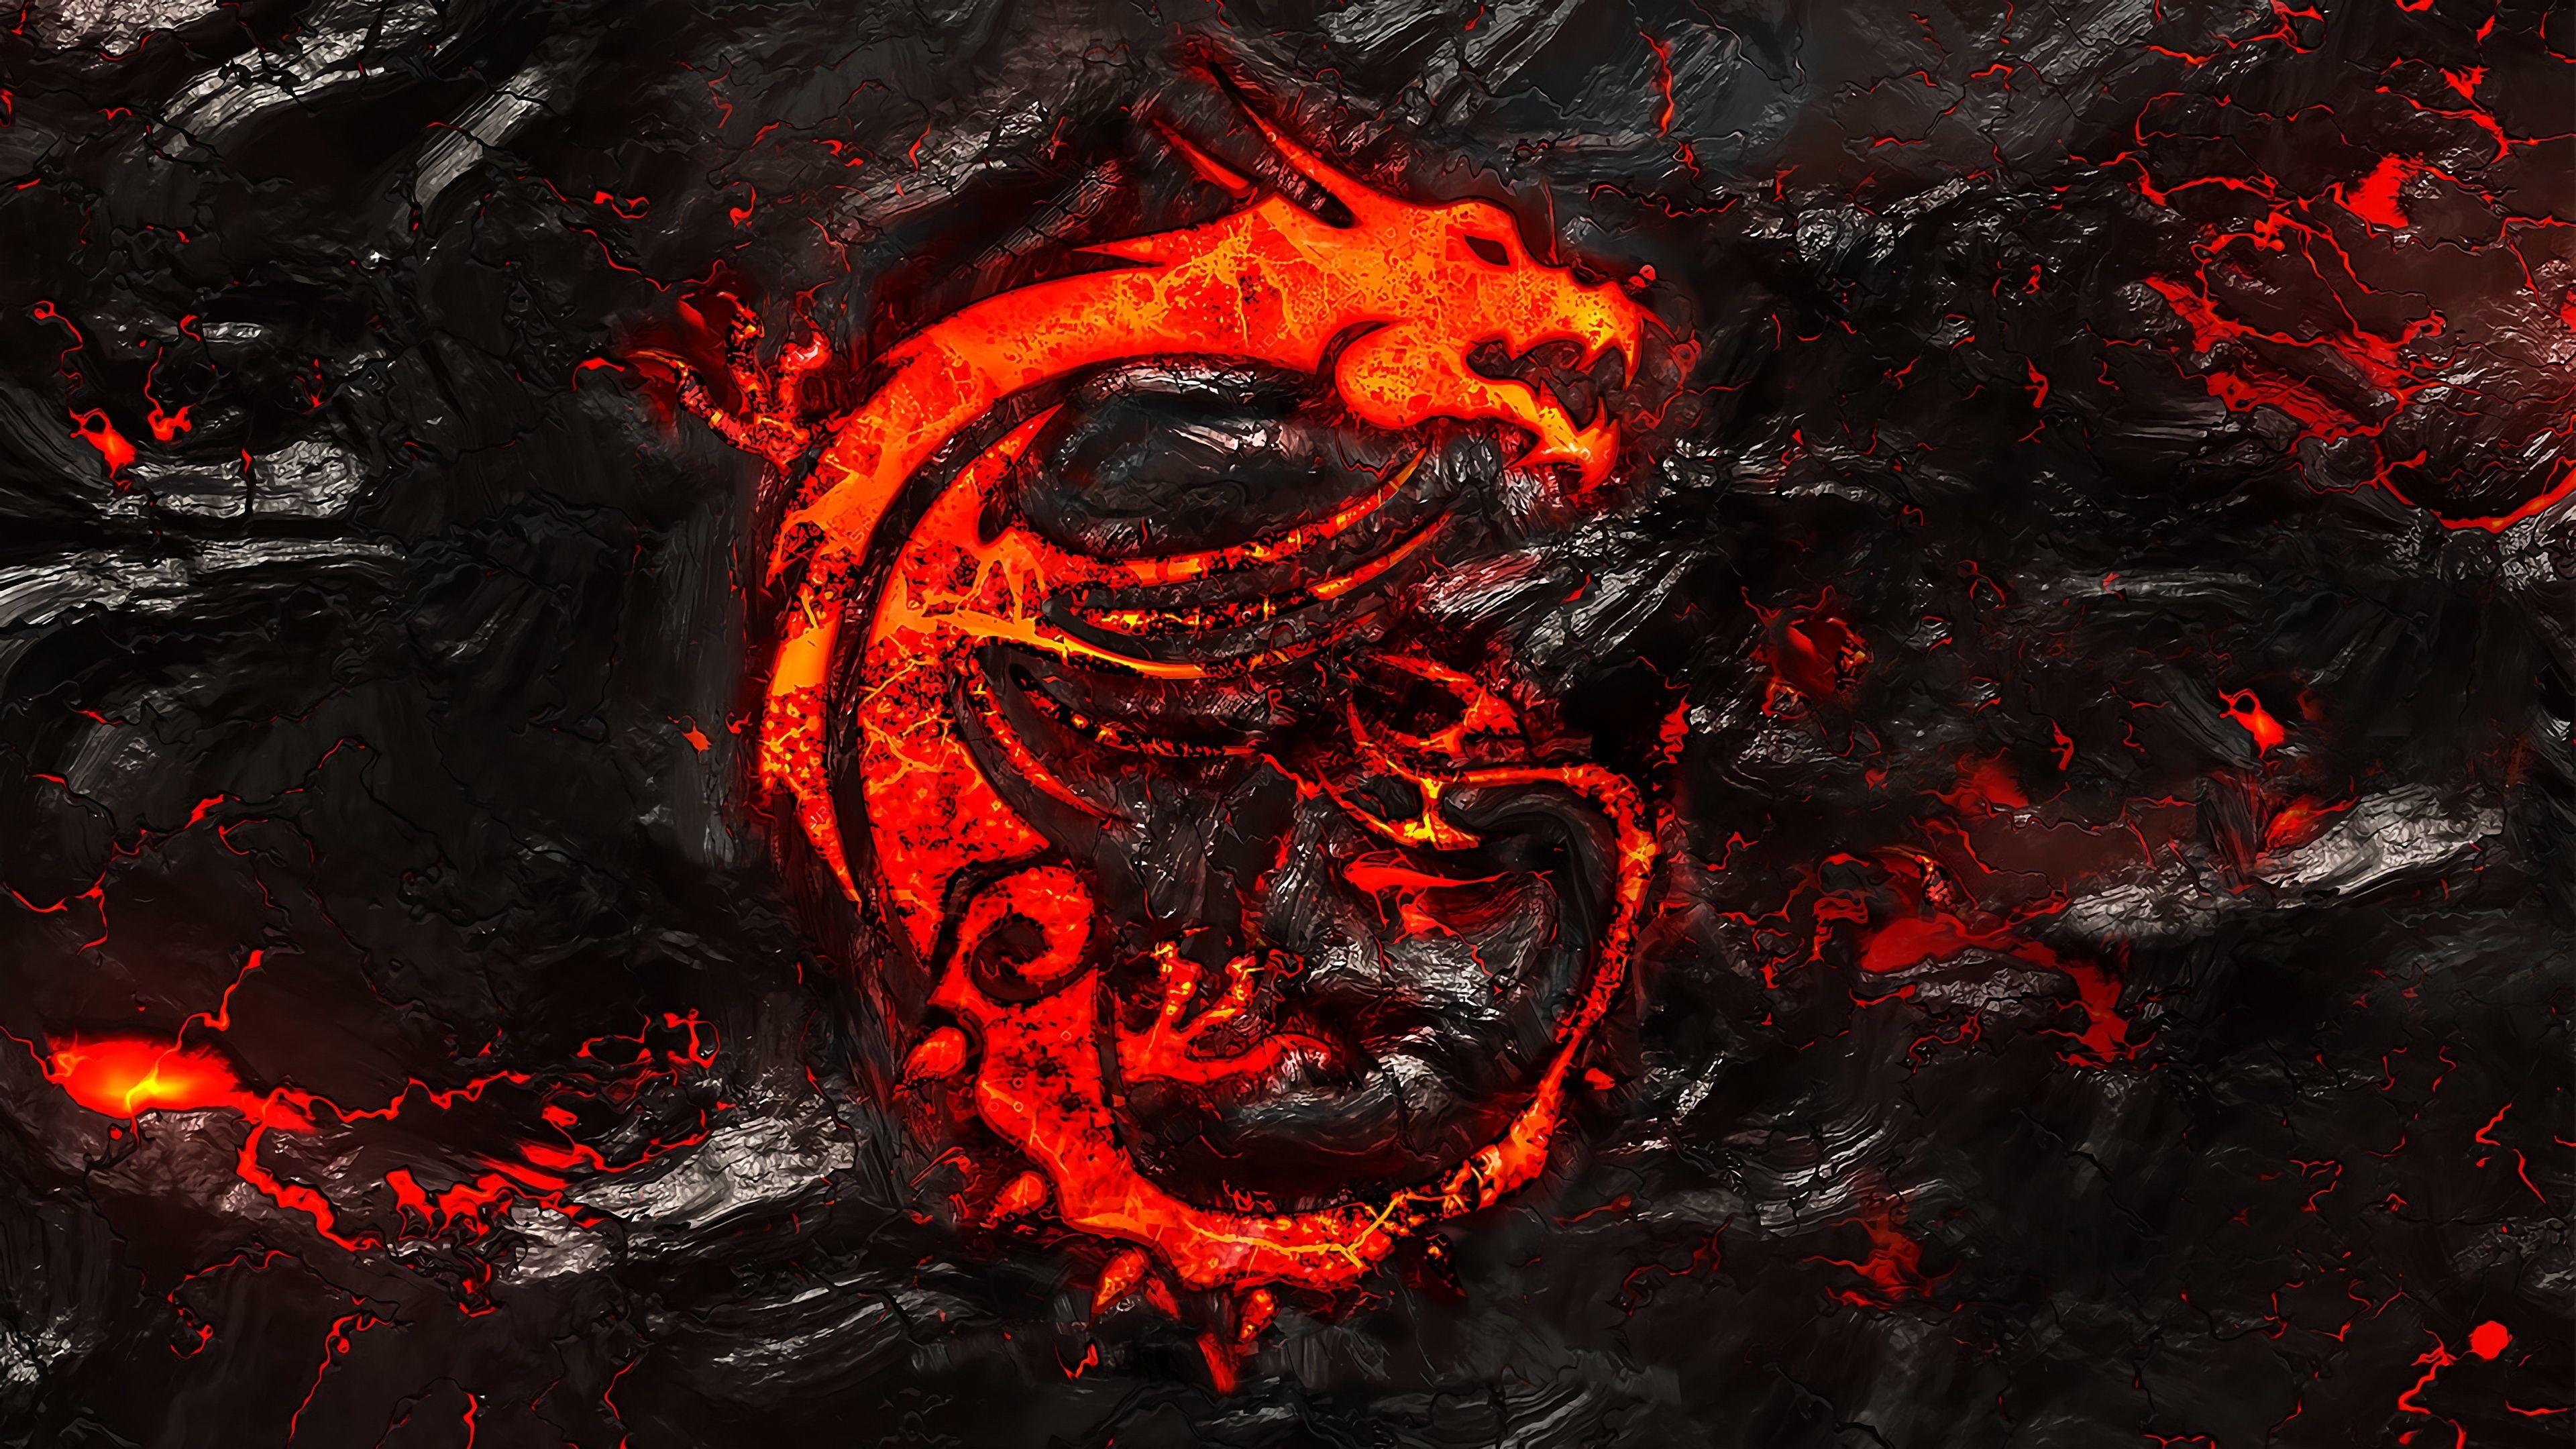 MSI Dragon Wallpaper